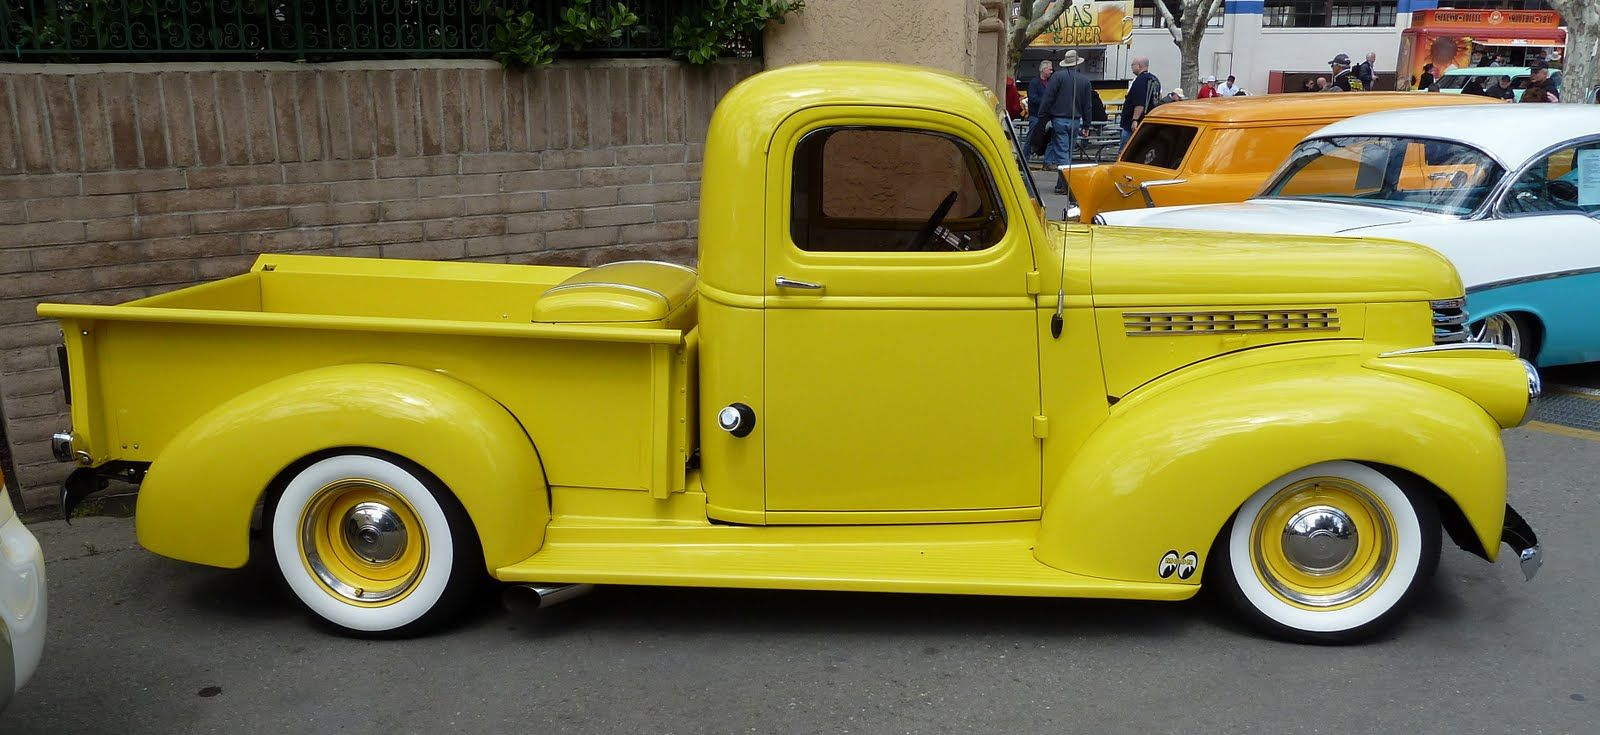 1946 Chevy Truck Yellow Fender | classic truck | Pinterest | Chevy ...